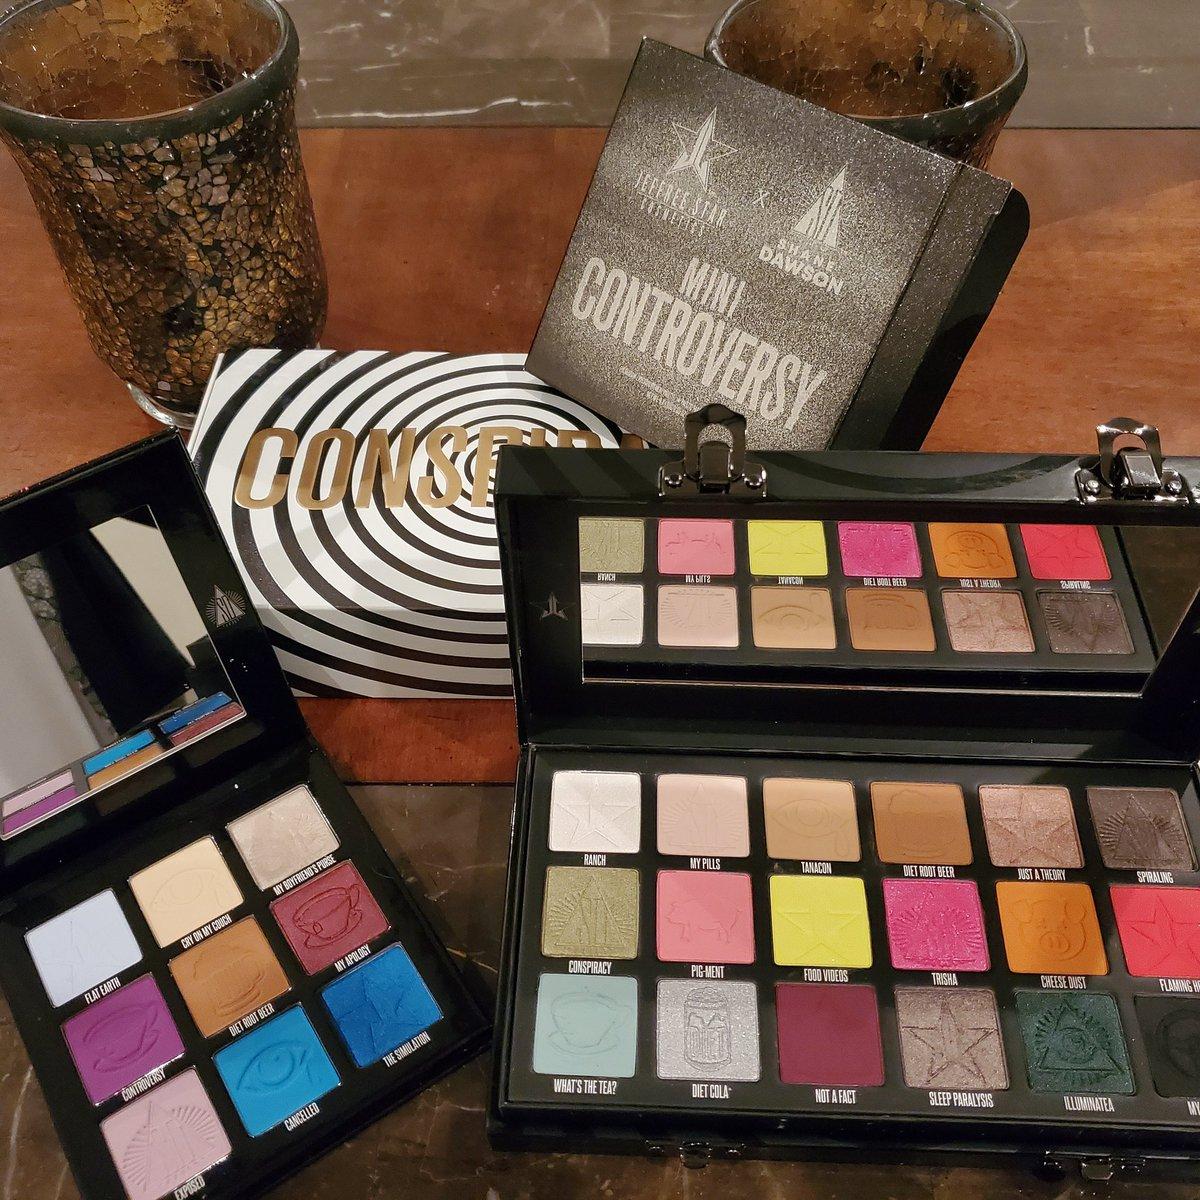 FINALLY!!! After USPS lost my package, it here!#jeffreestarcosmetics #conspiracy #conspiracypalette #makeup #shanedawson #jeffreestar #JSC